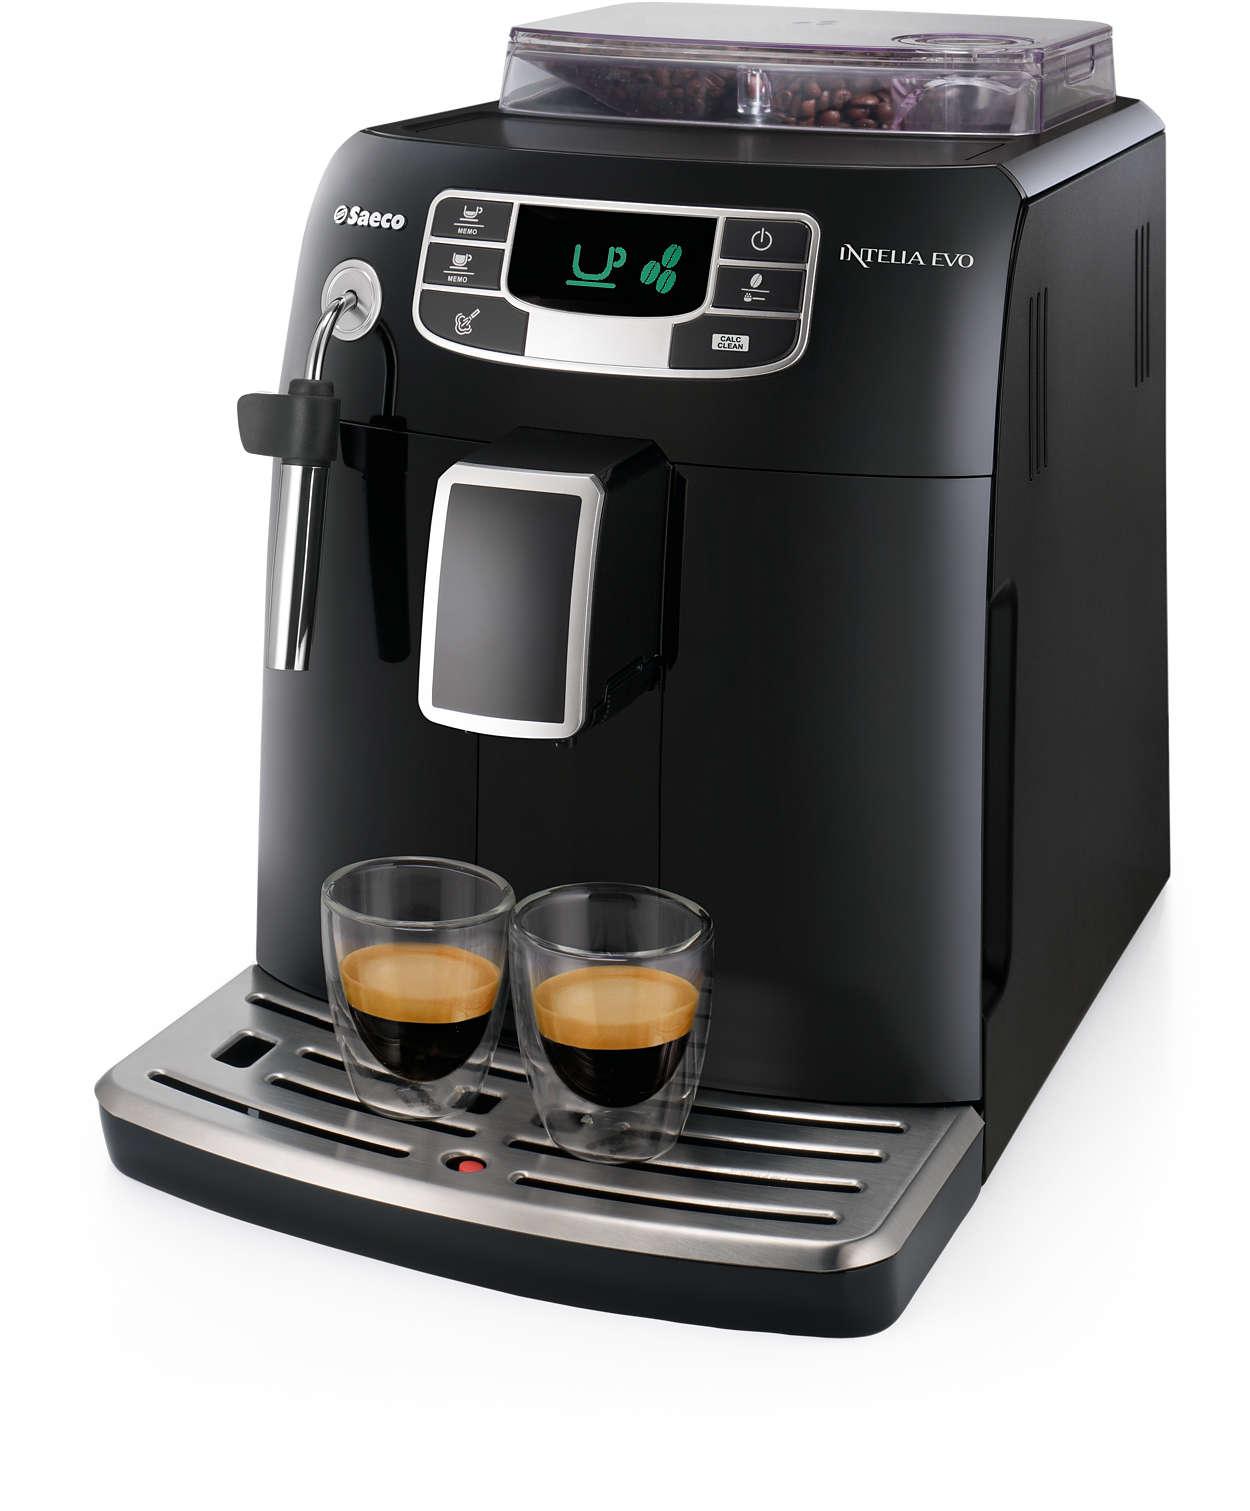 intelia evo kaffeevollautomat hd8751 95 saeco. Black Bedroom Furniture Sets. Home Design Ideas